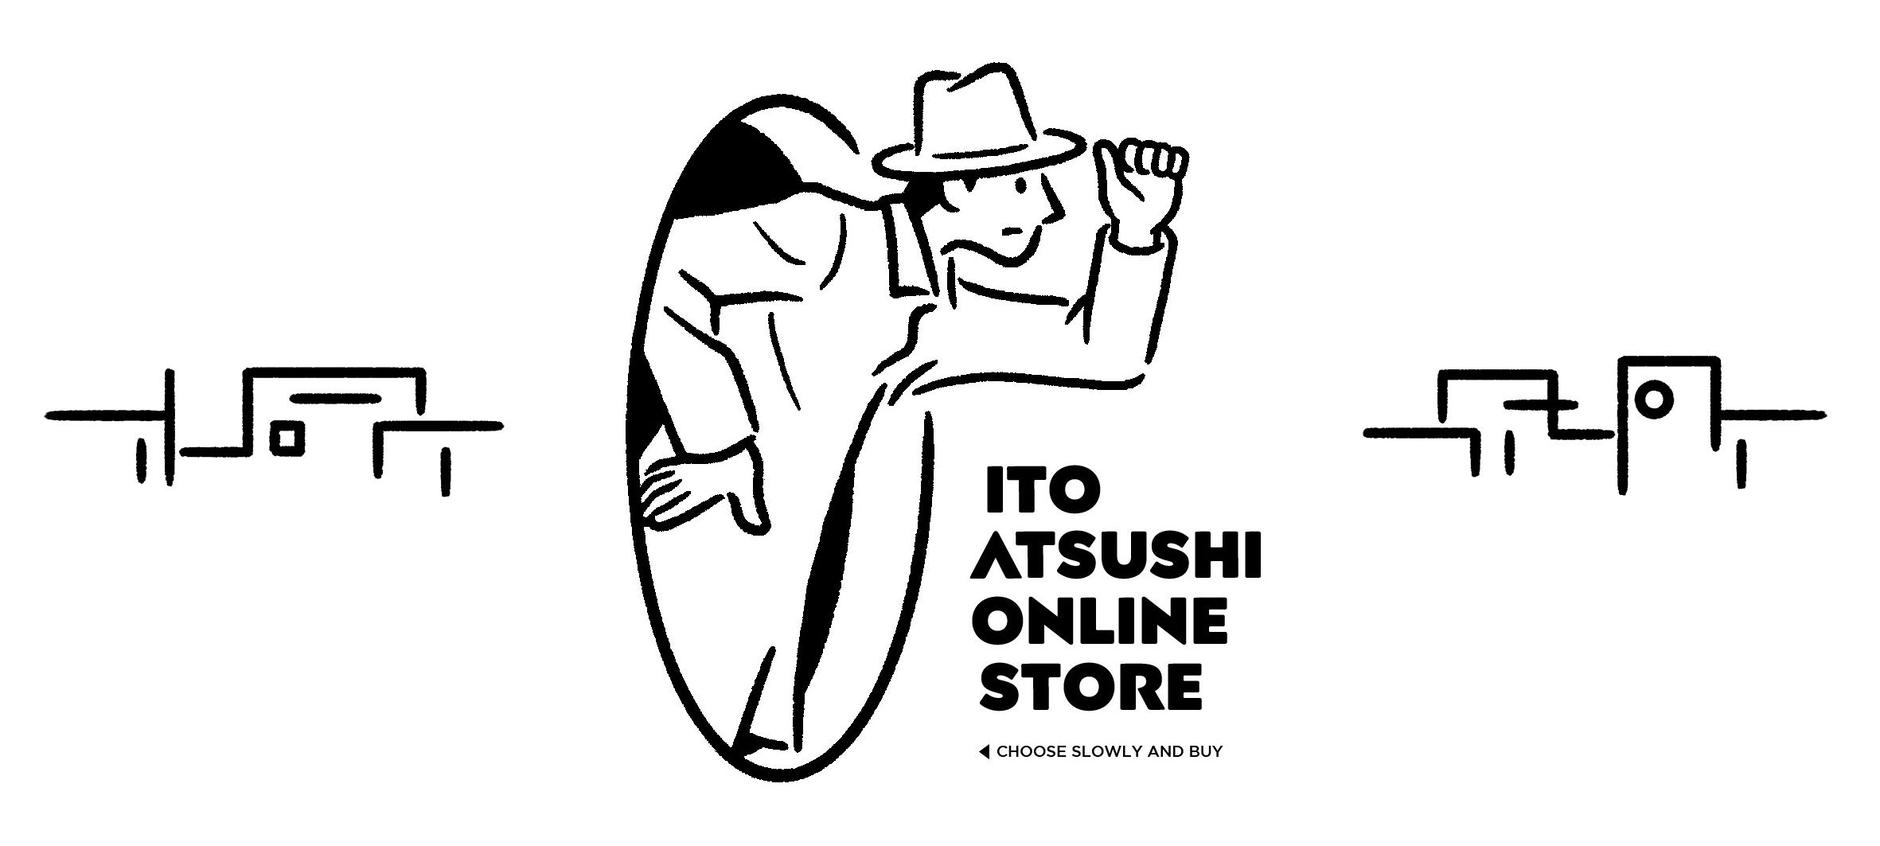 ITO ATSUSHI online store